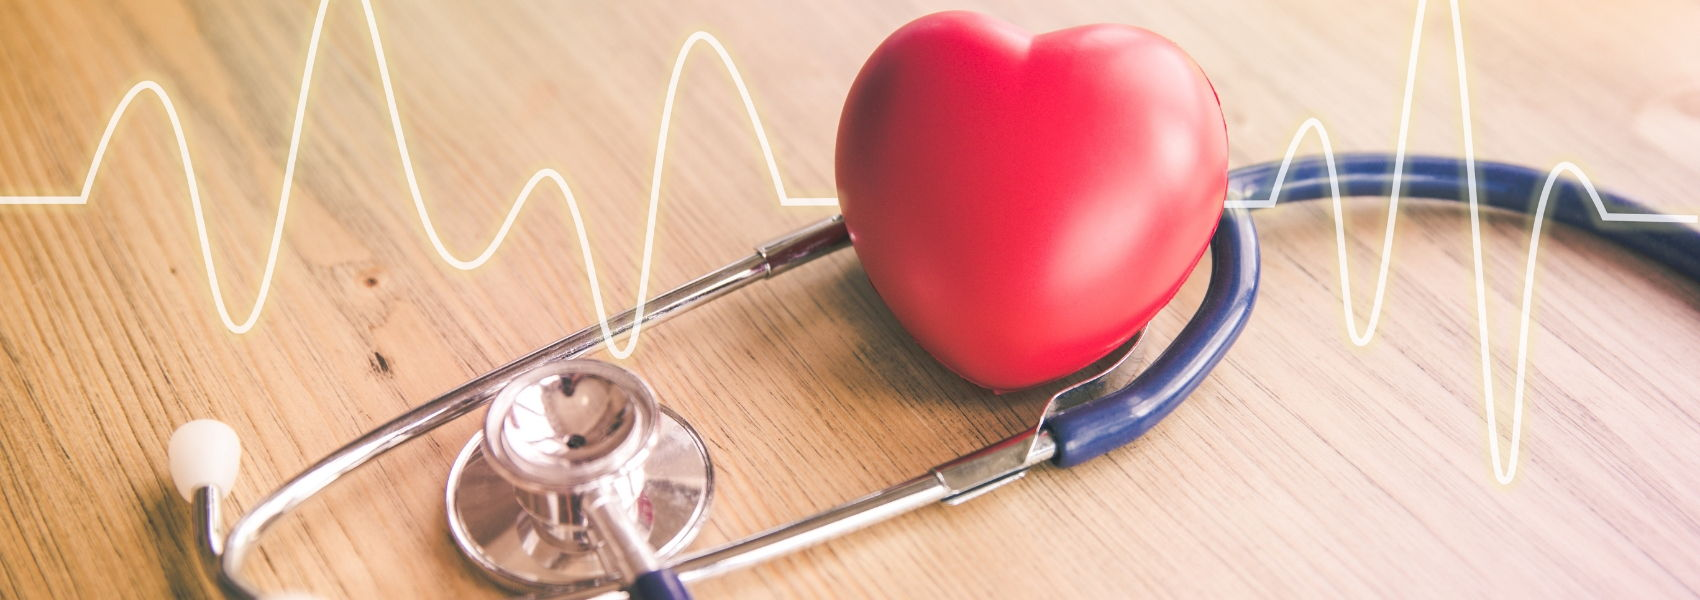 Custo real dos enfartes e AVC é o dobro do relatado